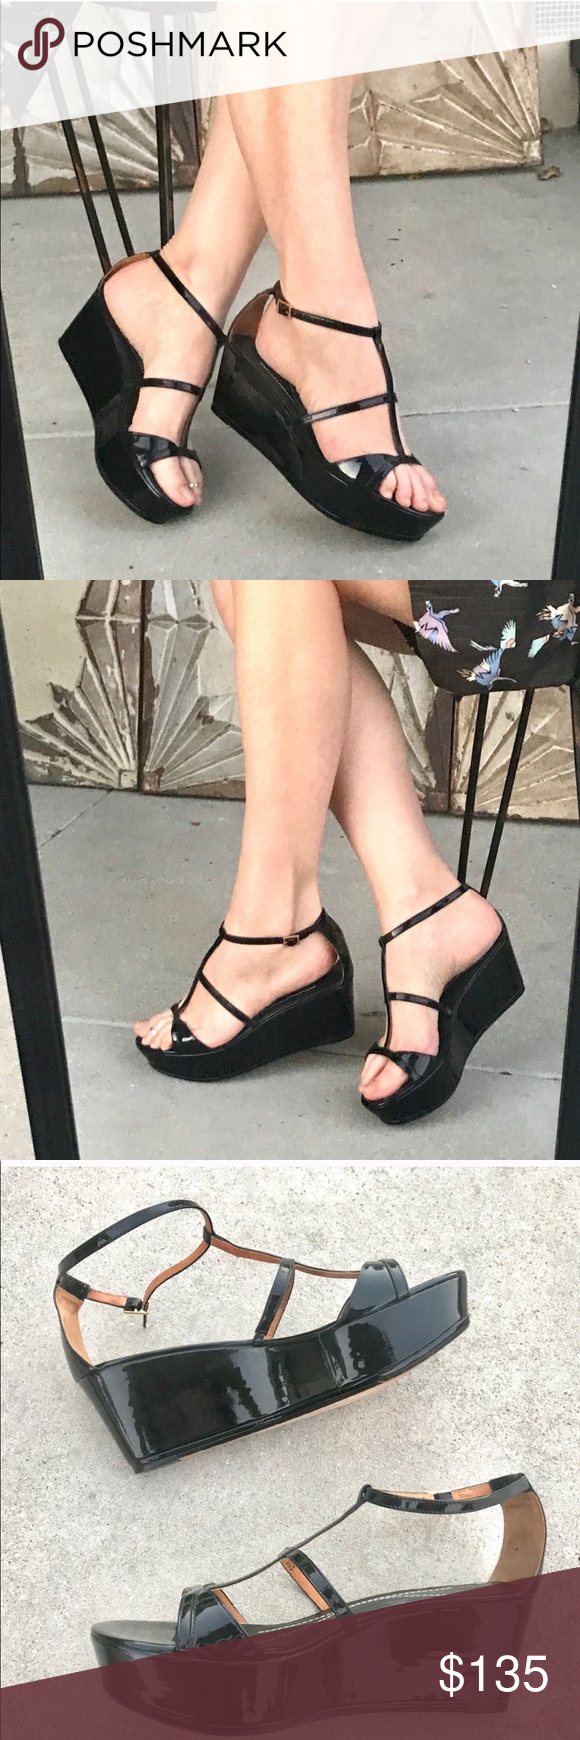 Kate Spade Black Platform Sandals Wedge Heels 8 5 Black Platform Sandals Kate Spade Black Kate Spade Shoes Wedges